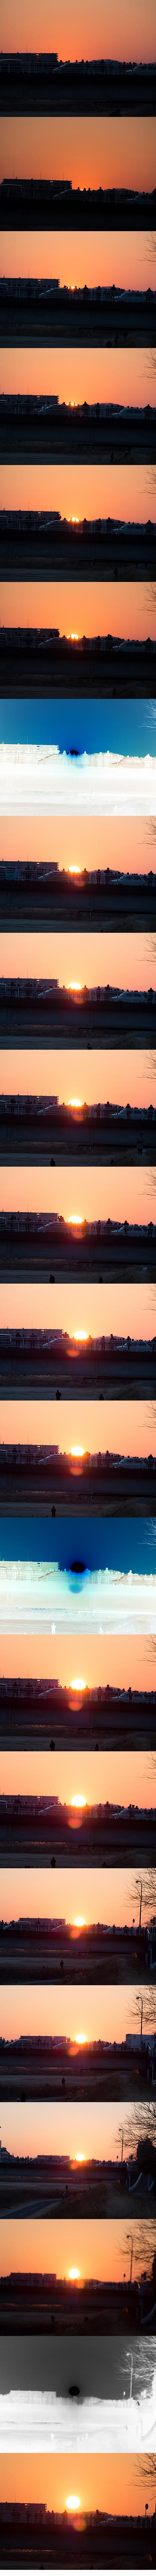 searial sunrise